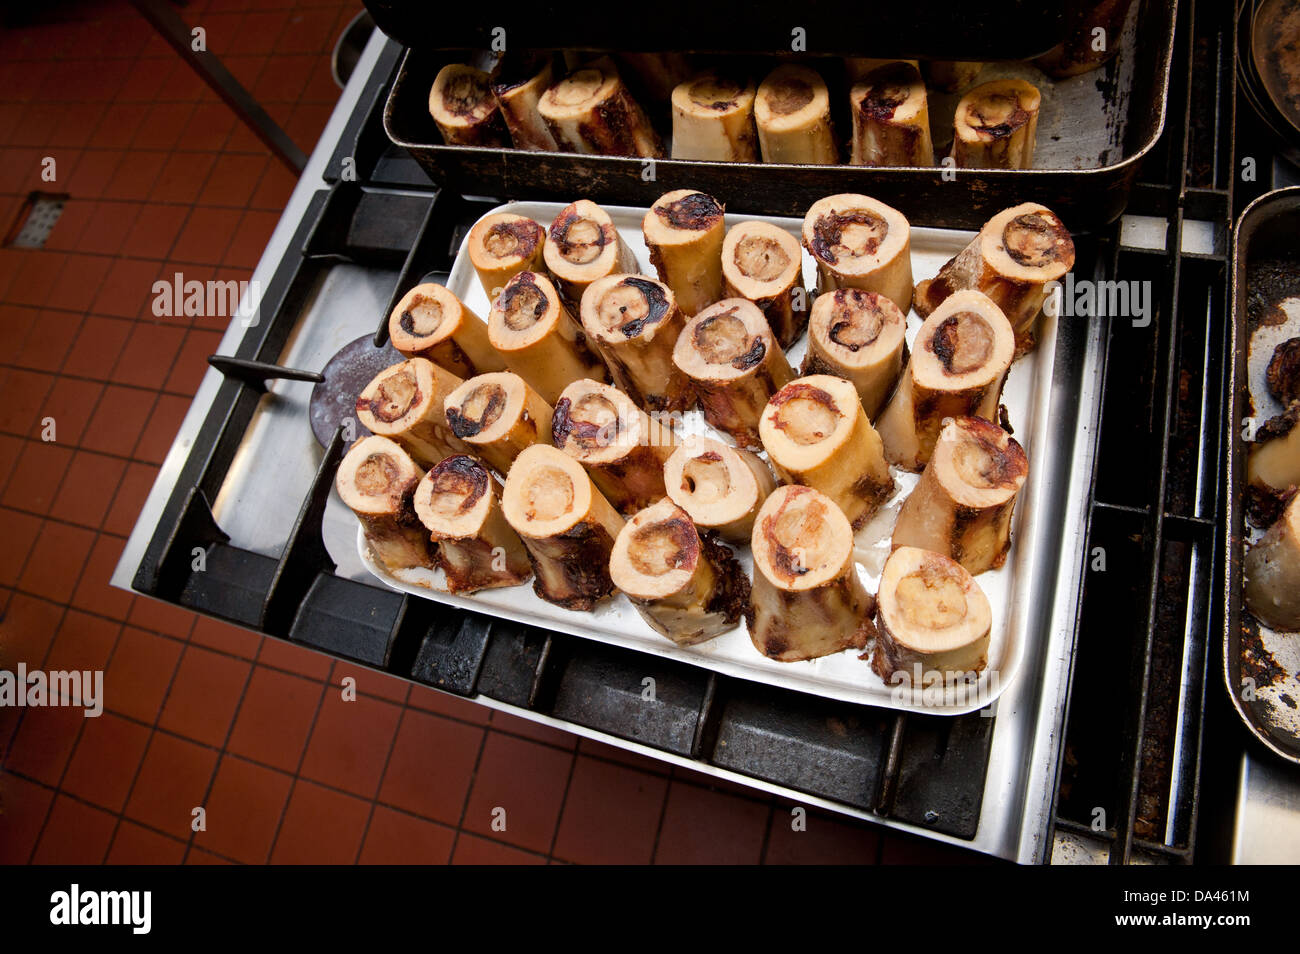 Roast Bone Marrow on a Baking Tray in Kitchen Setting Stock Photo